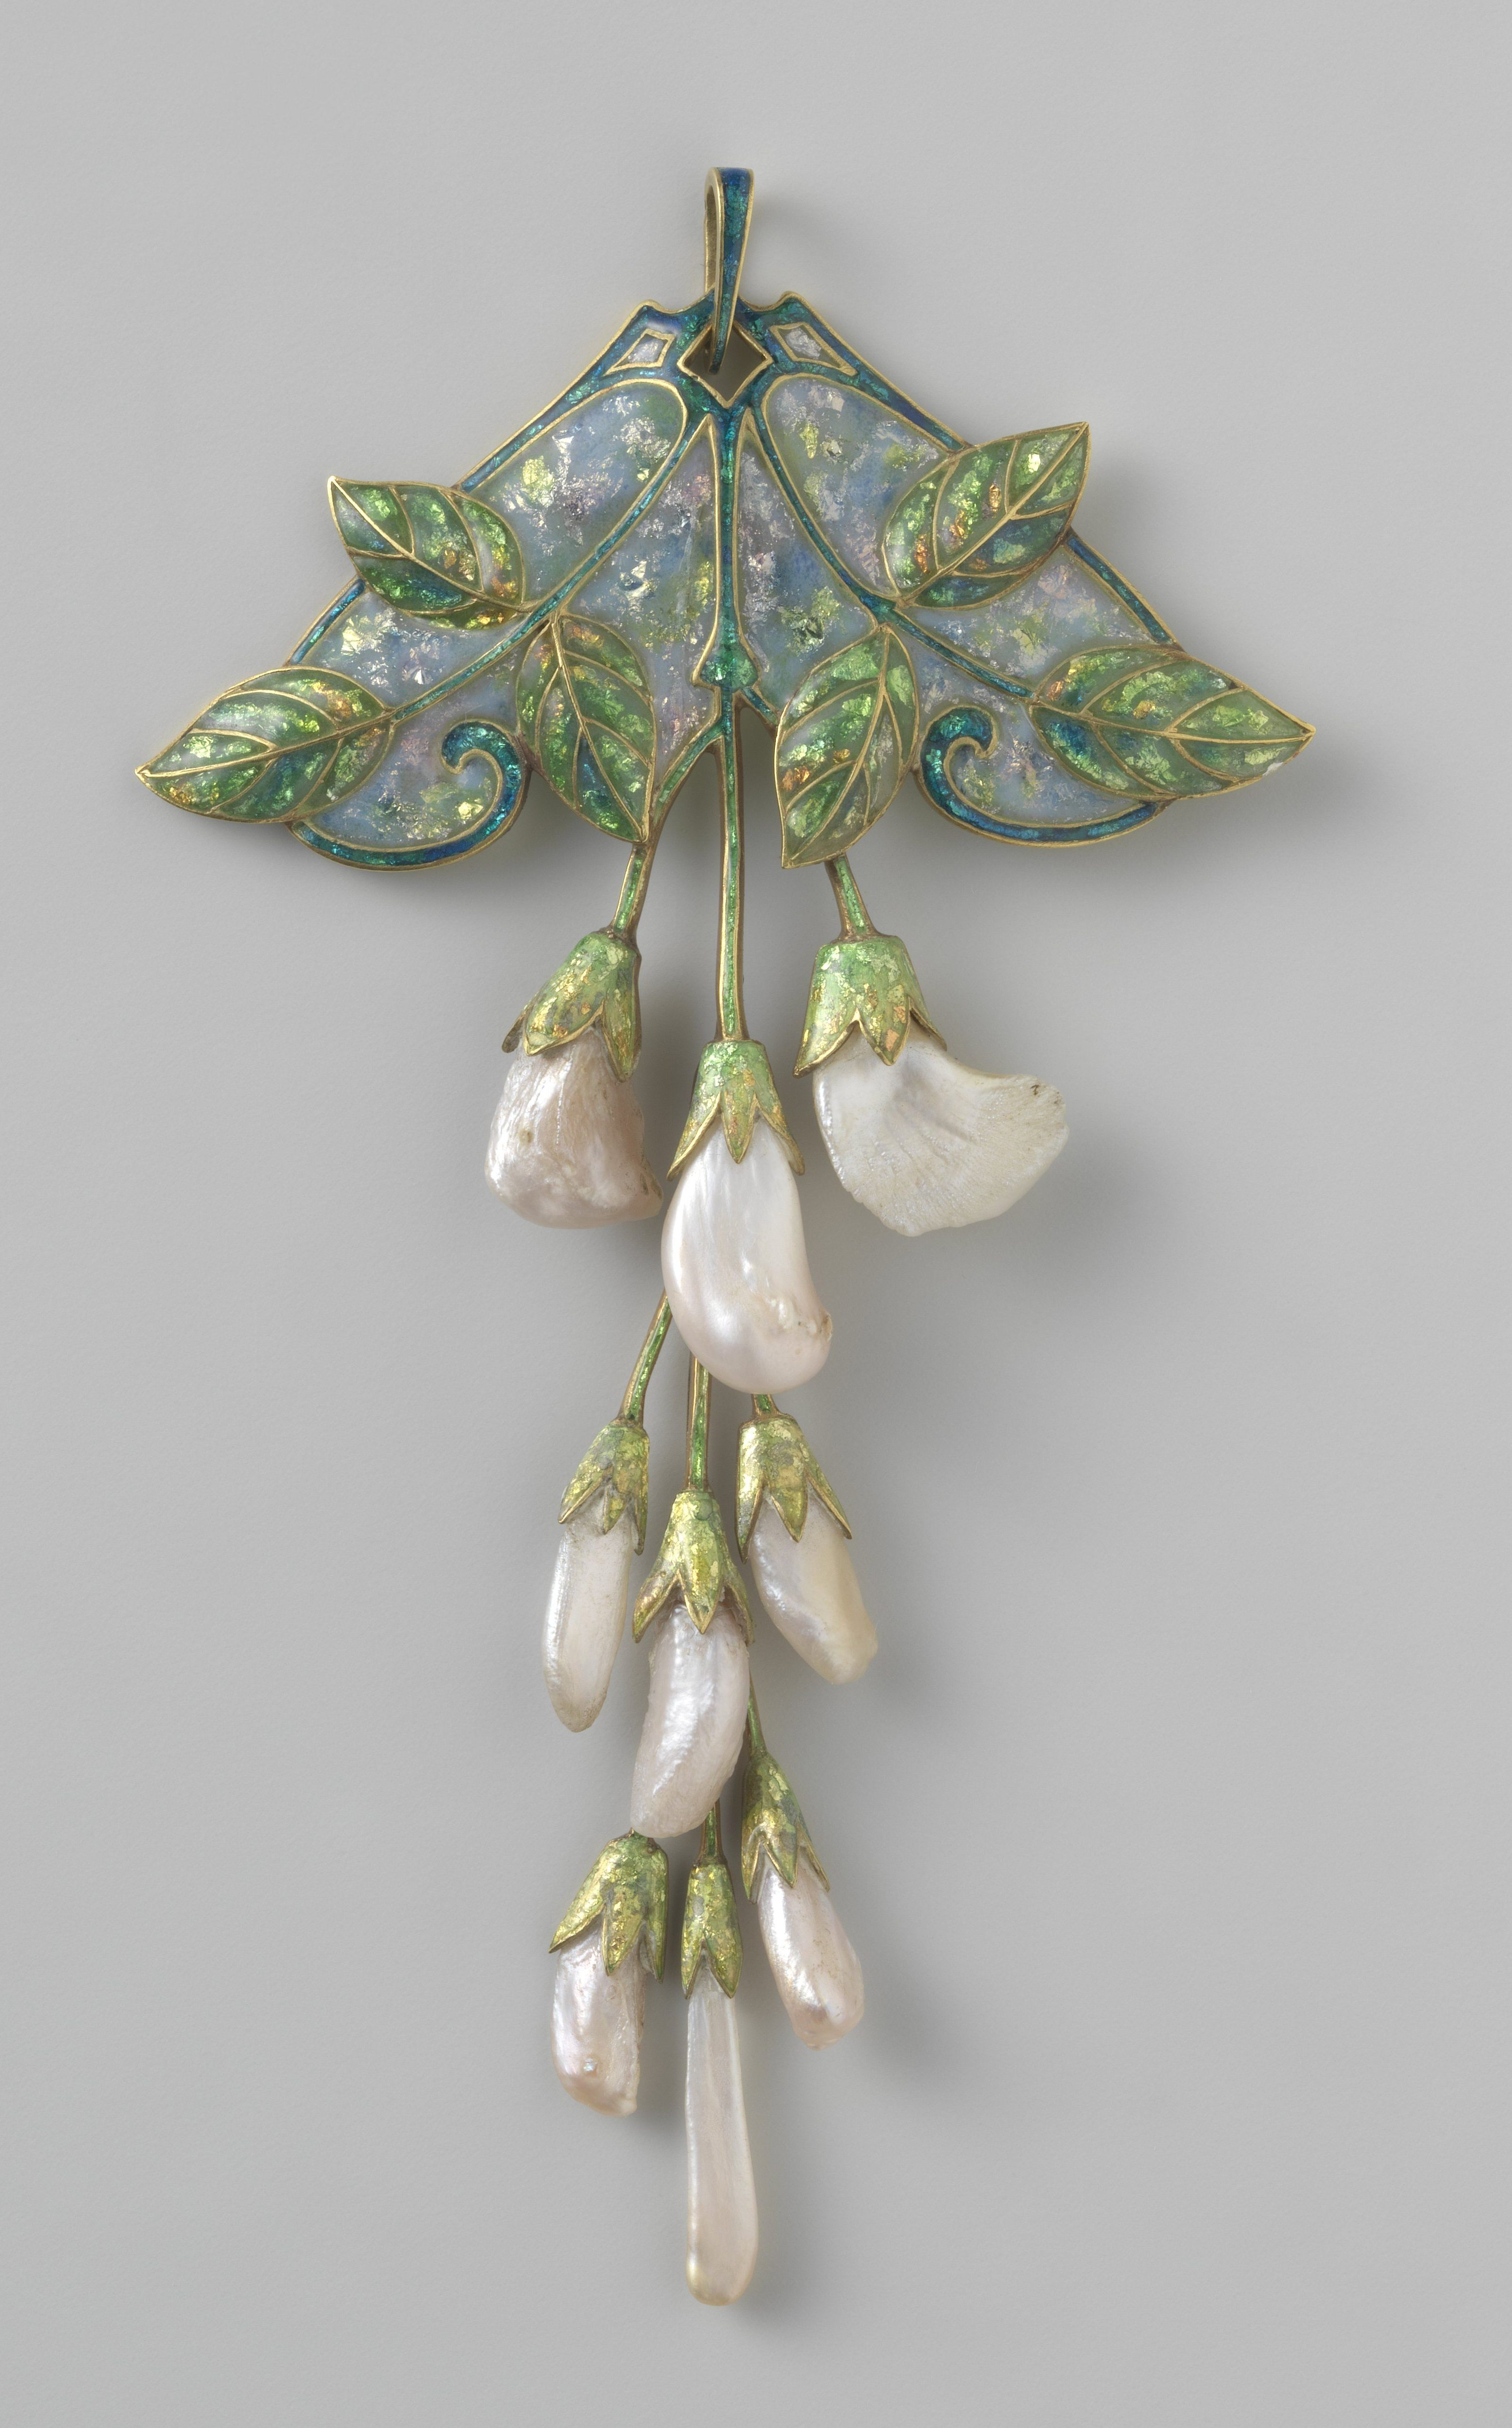 Georges Fouquet, hanger, circa 1909. Collectie Rijksmuseum, BK-1970-64, publiek domein (CC0 1.0)